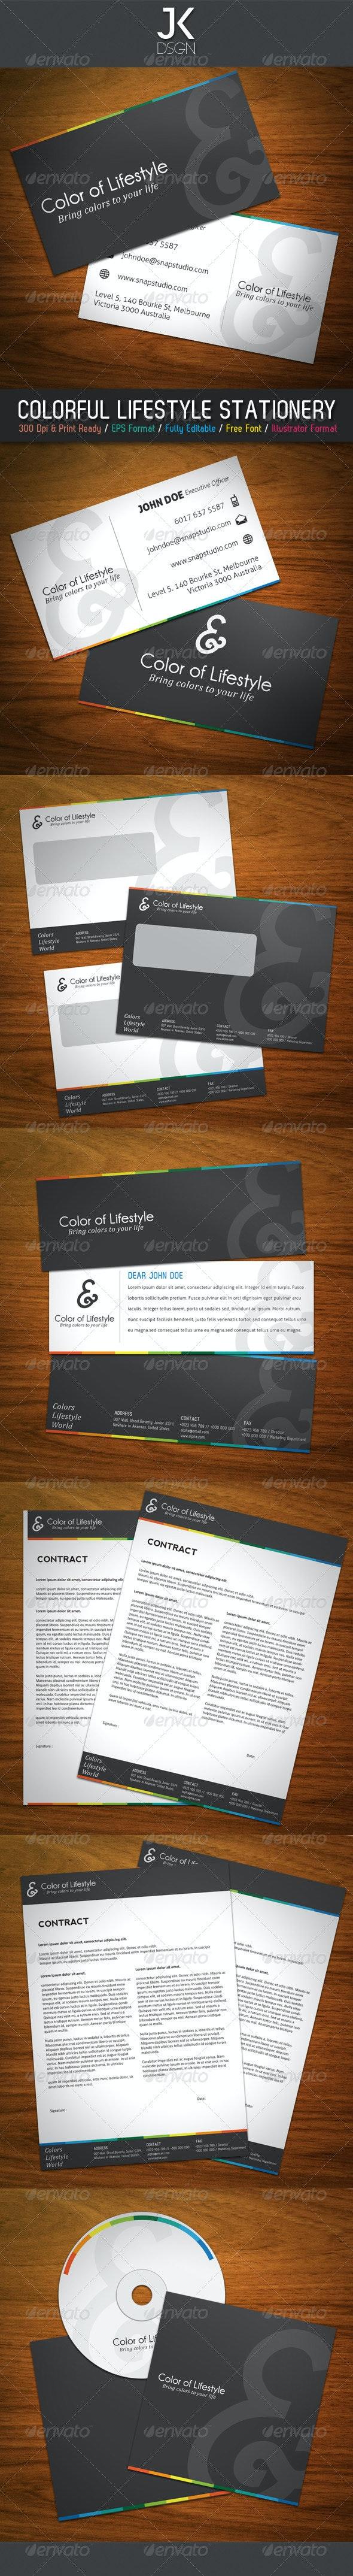 JK Colorful Lifestyles Stationery - Stationery Print Templates